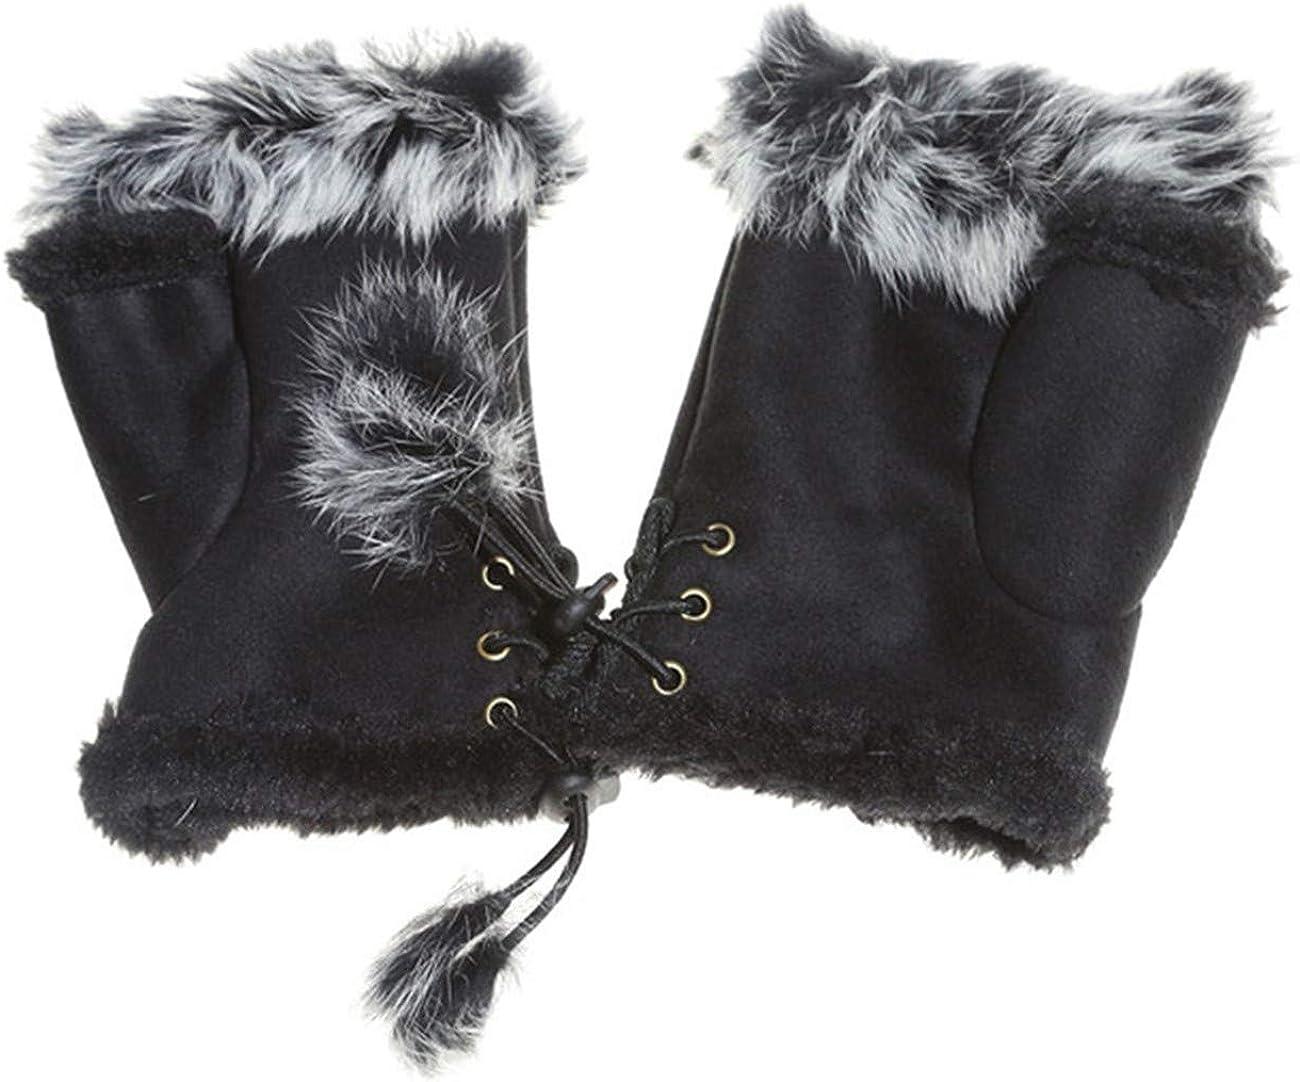 ZALING Beautiful Winter Suede Gloves Faux Rabbit Hair Fingerless Mittens For Women Practical Half Finger Female Mitten